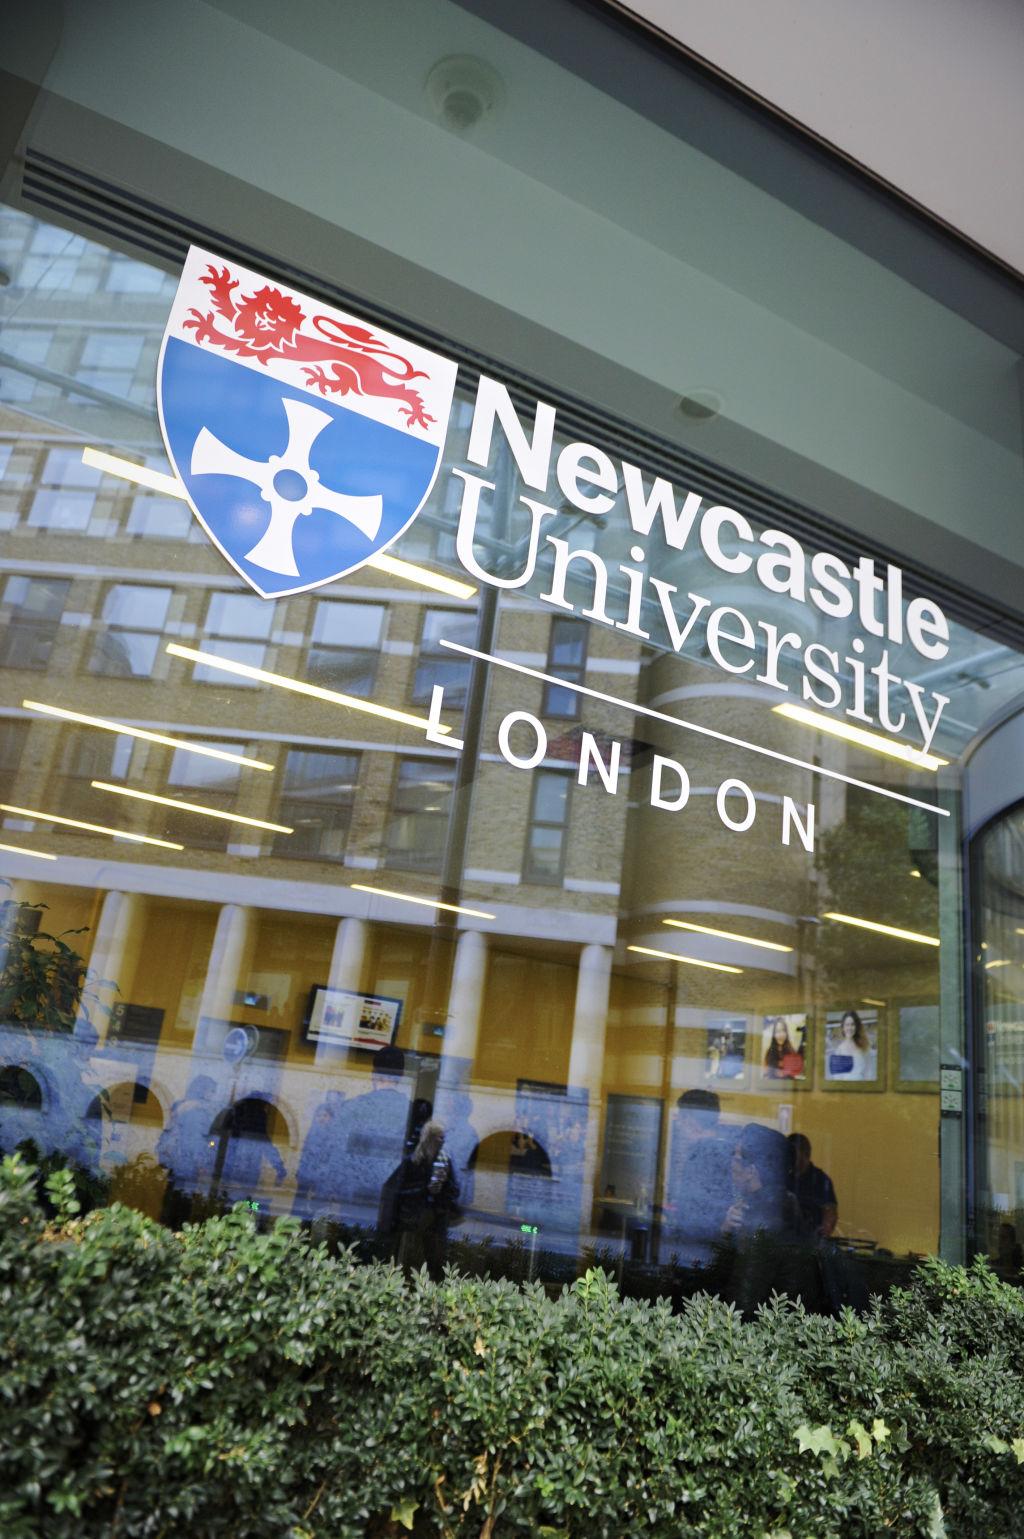 Newcastle University London entrance